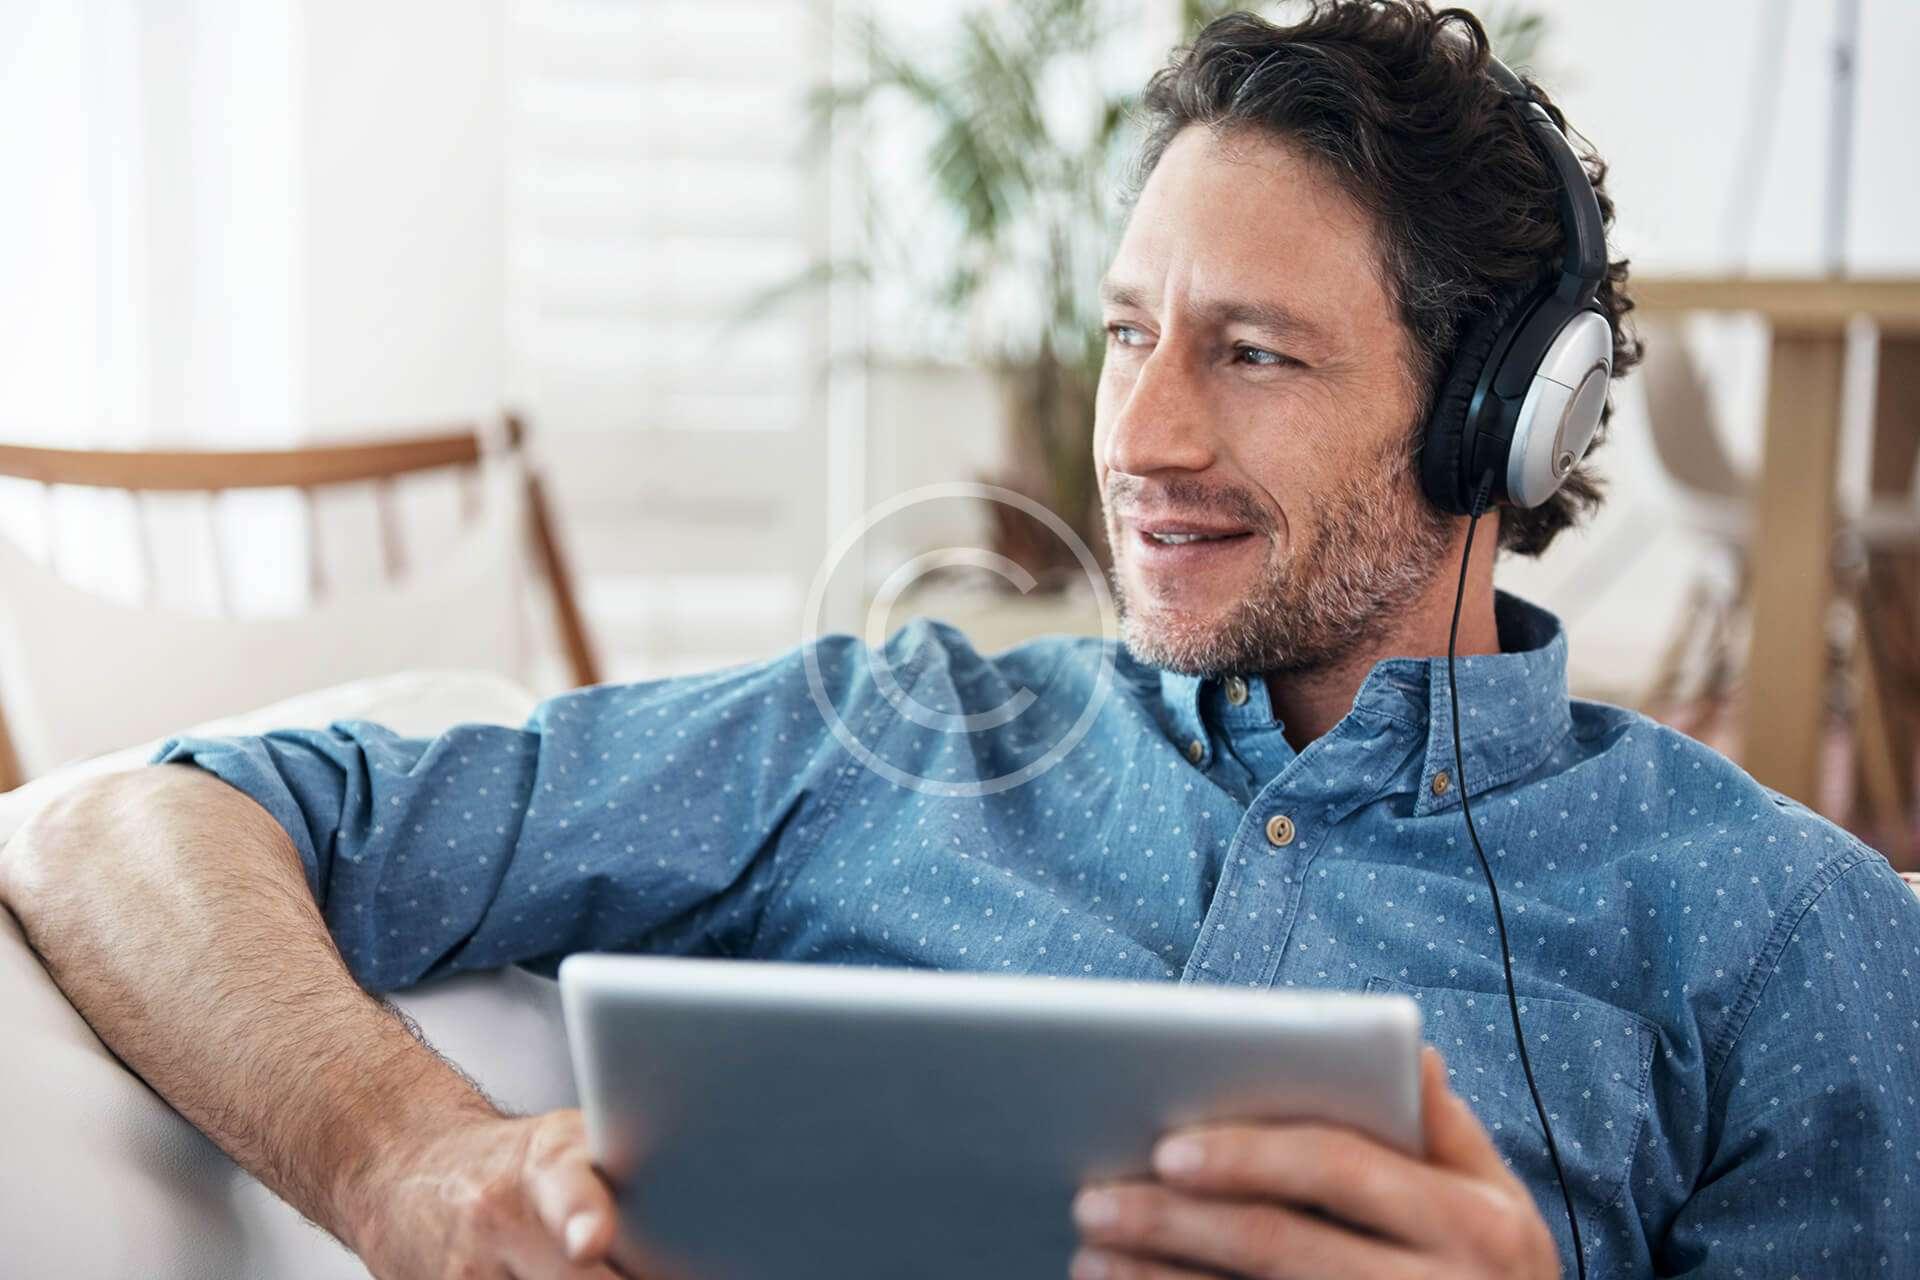 Find the Best Student Broadband Deals